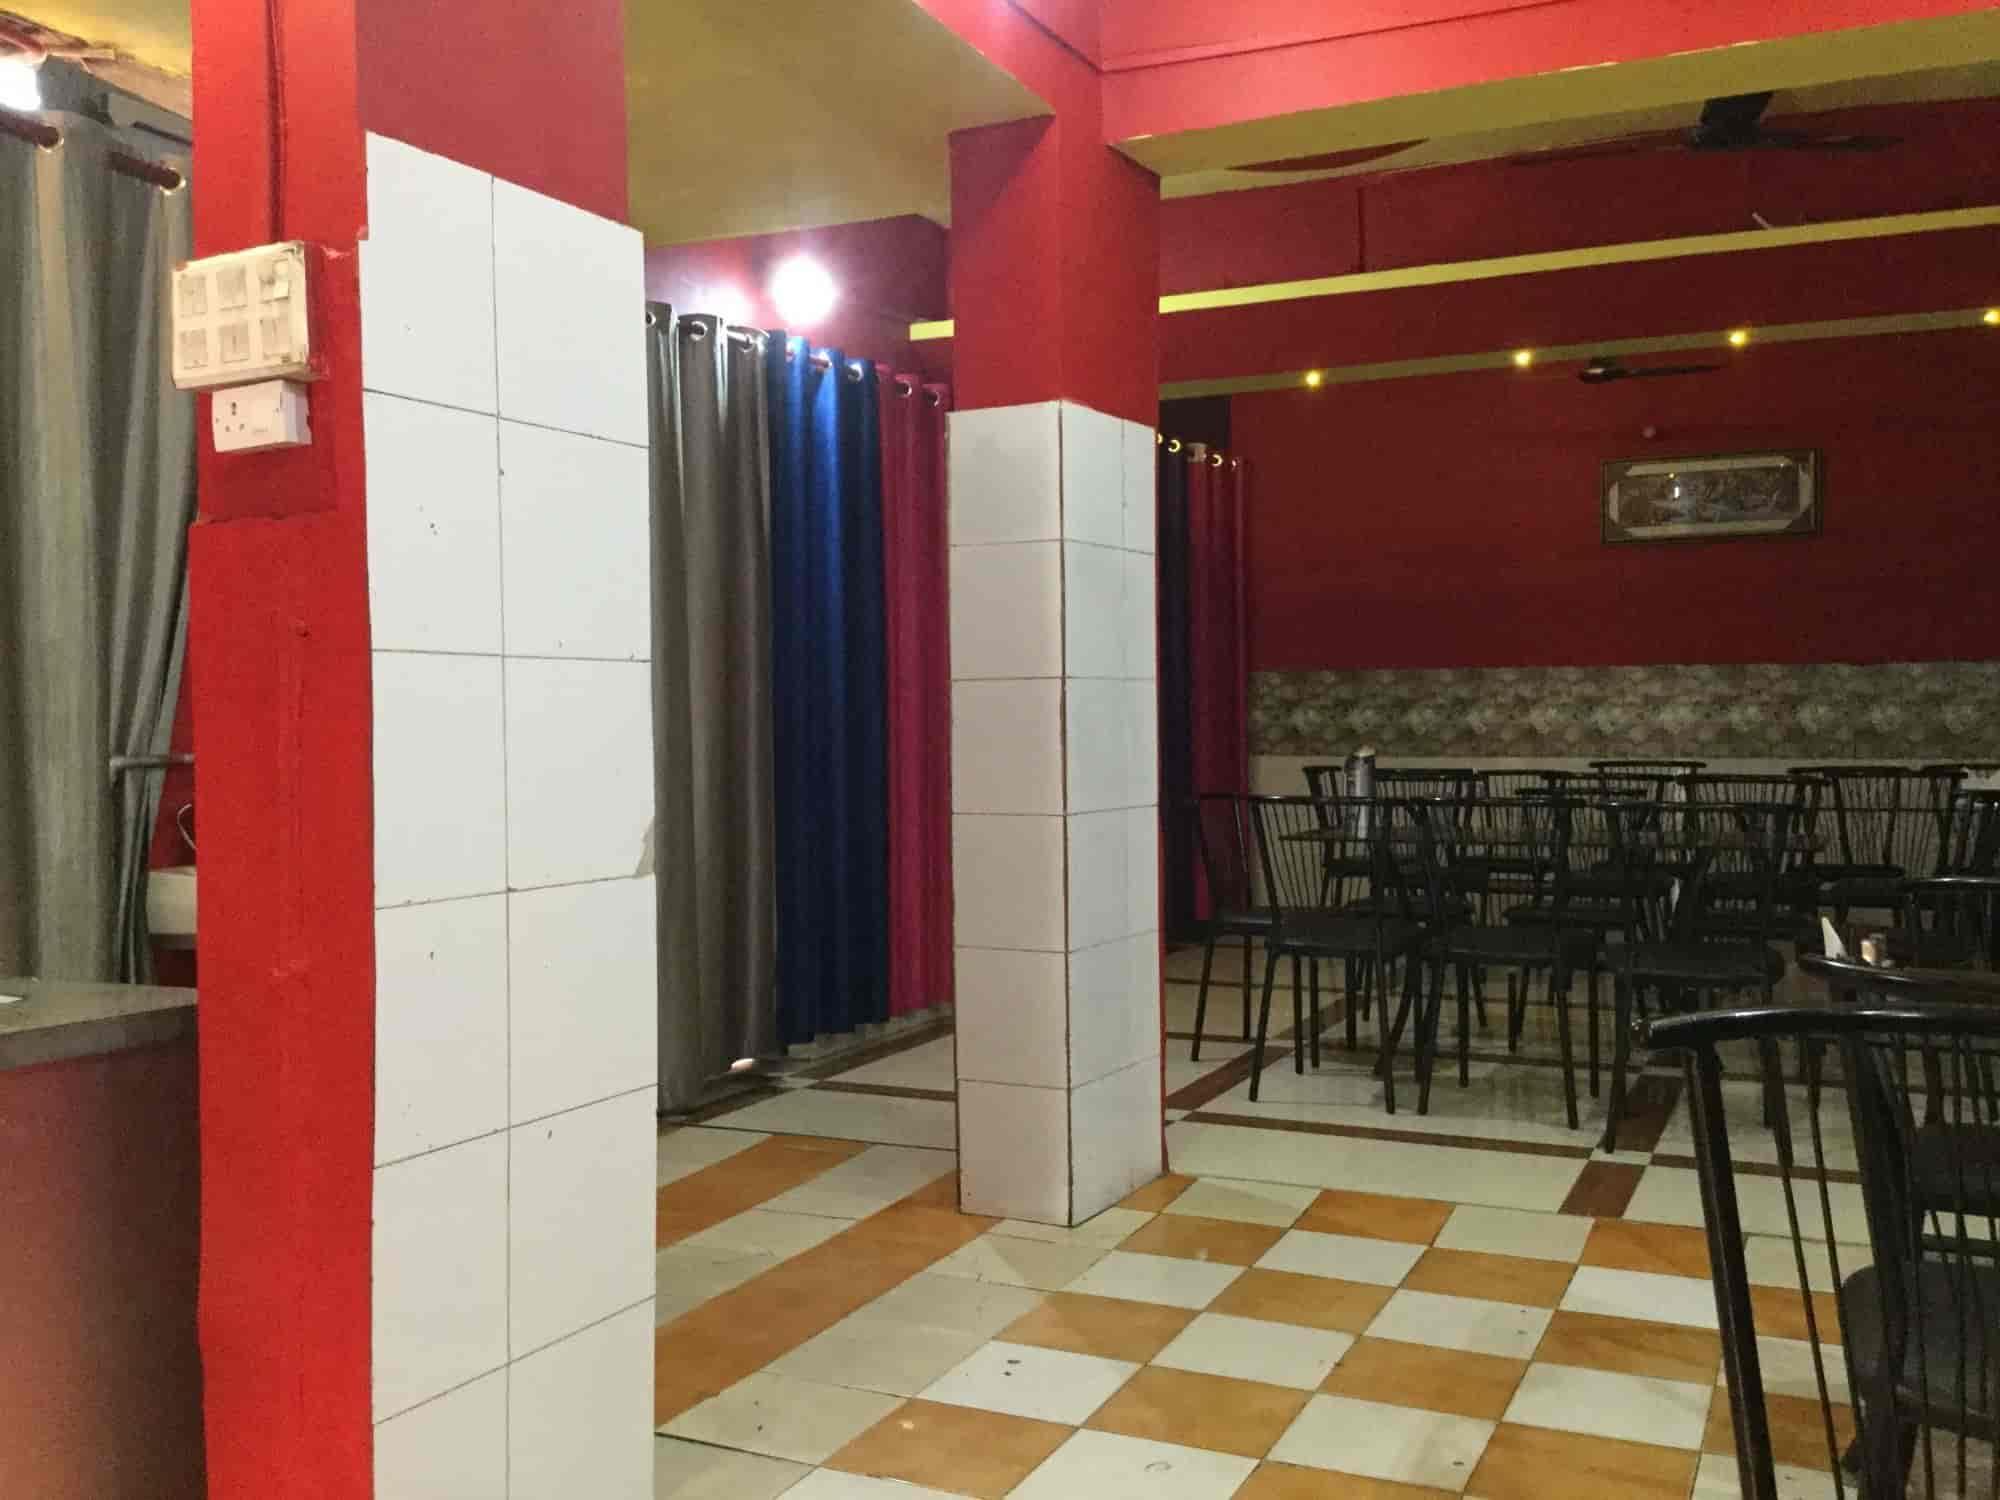 Krazy Kitchen Photos, Gomti Nagar, Lucknow- Pictures & Images ...